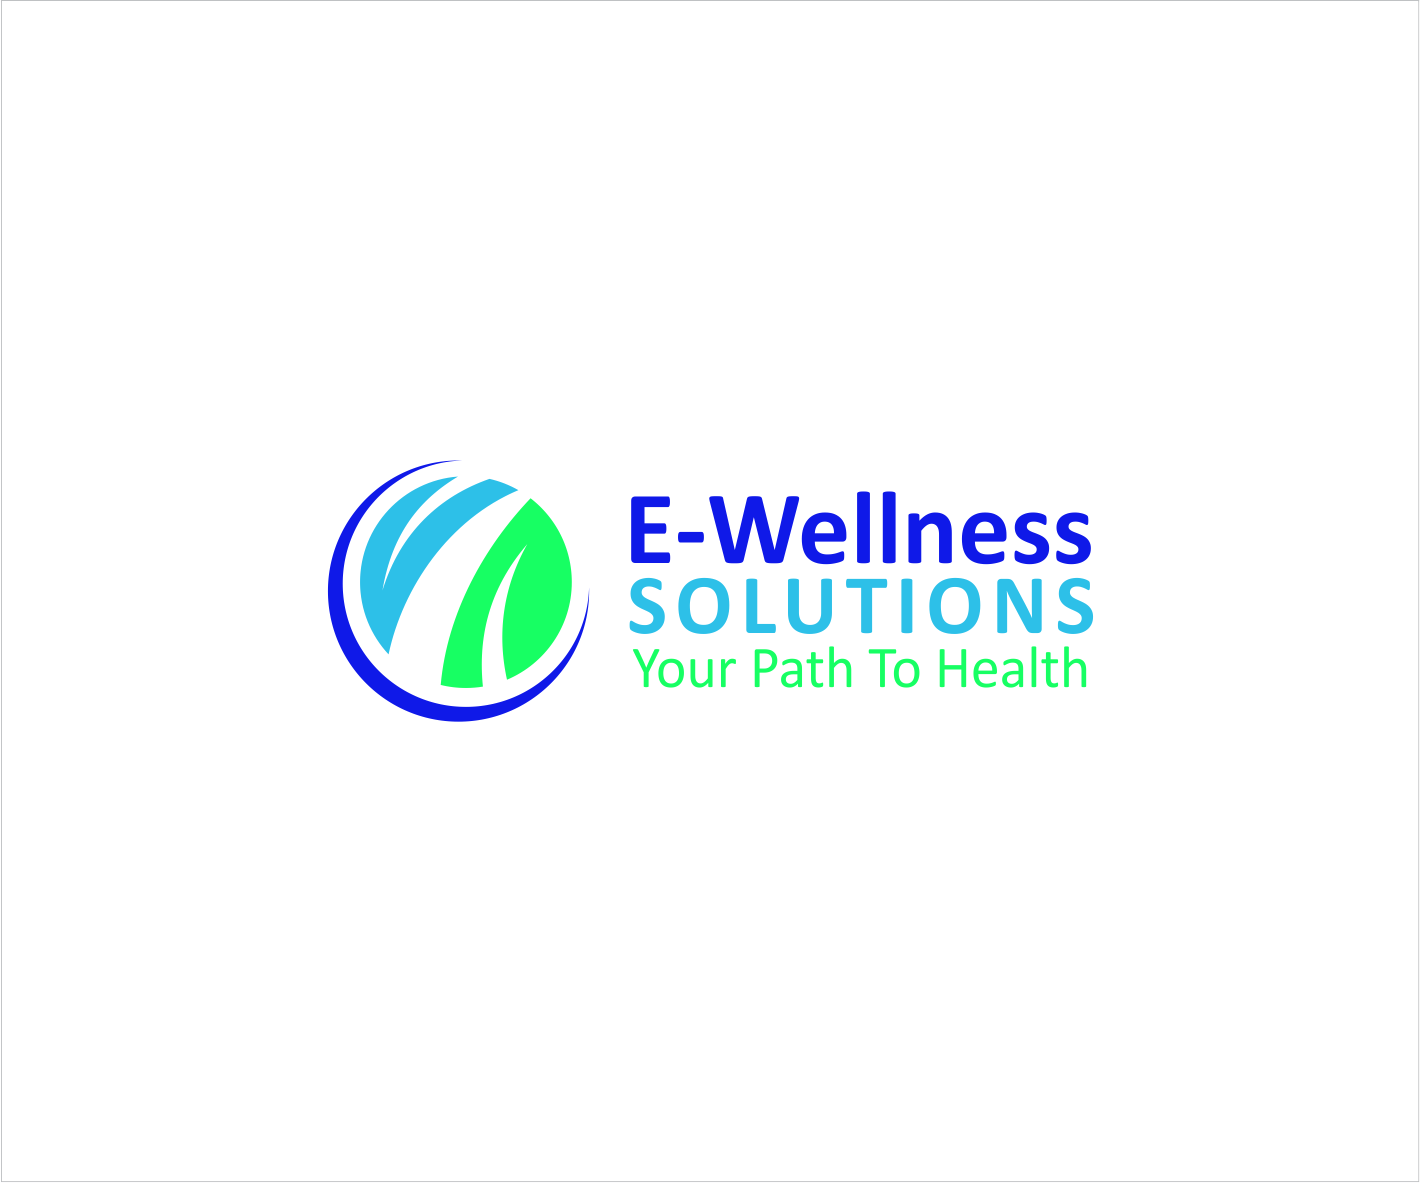 elegant playful health and wellness logo design for your path to rh designcrowd com  health and wellness logo vector